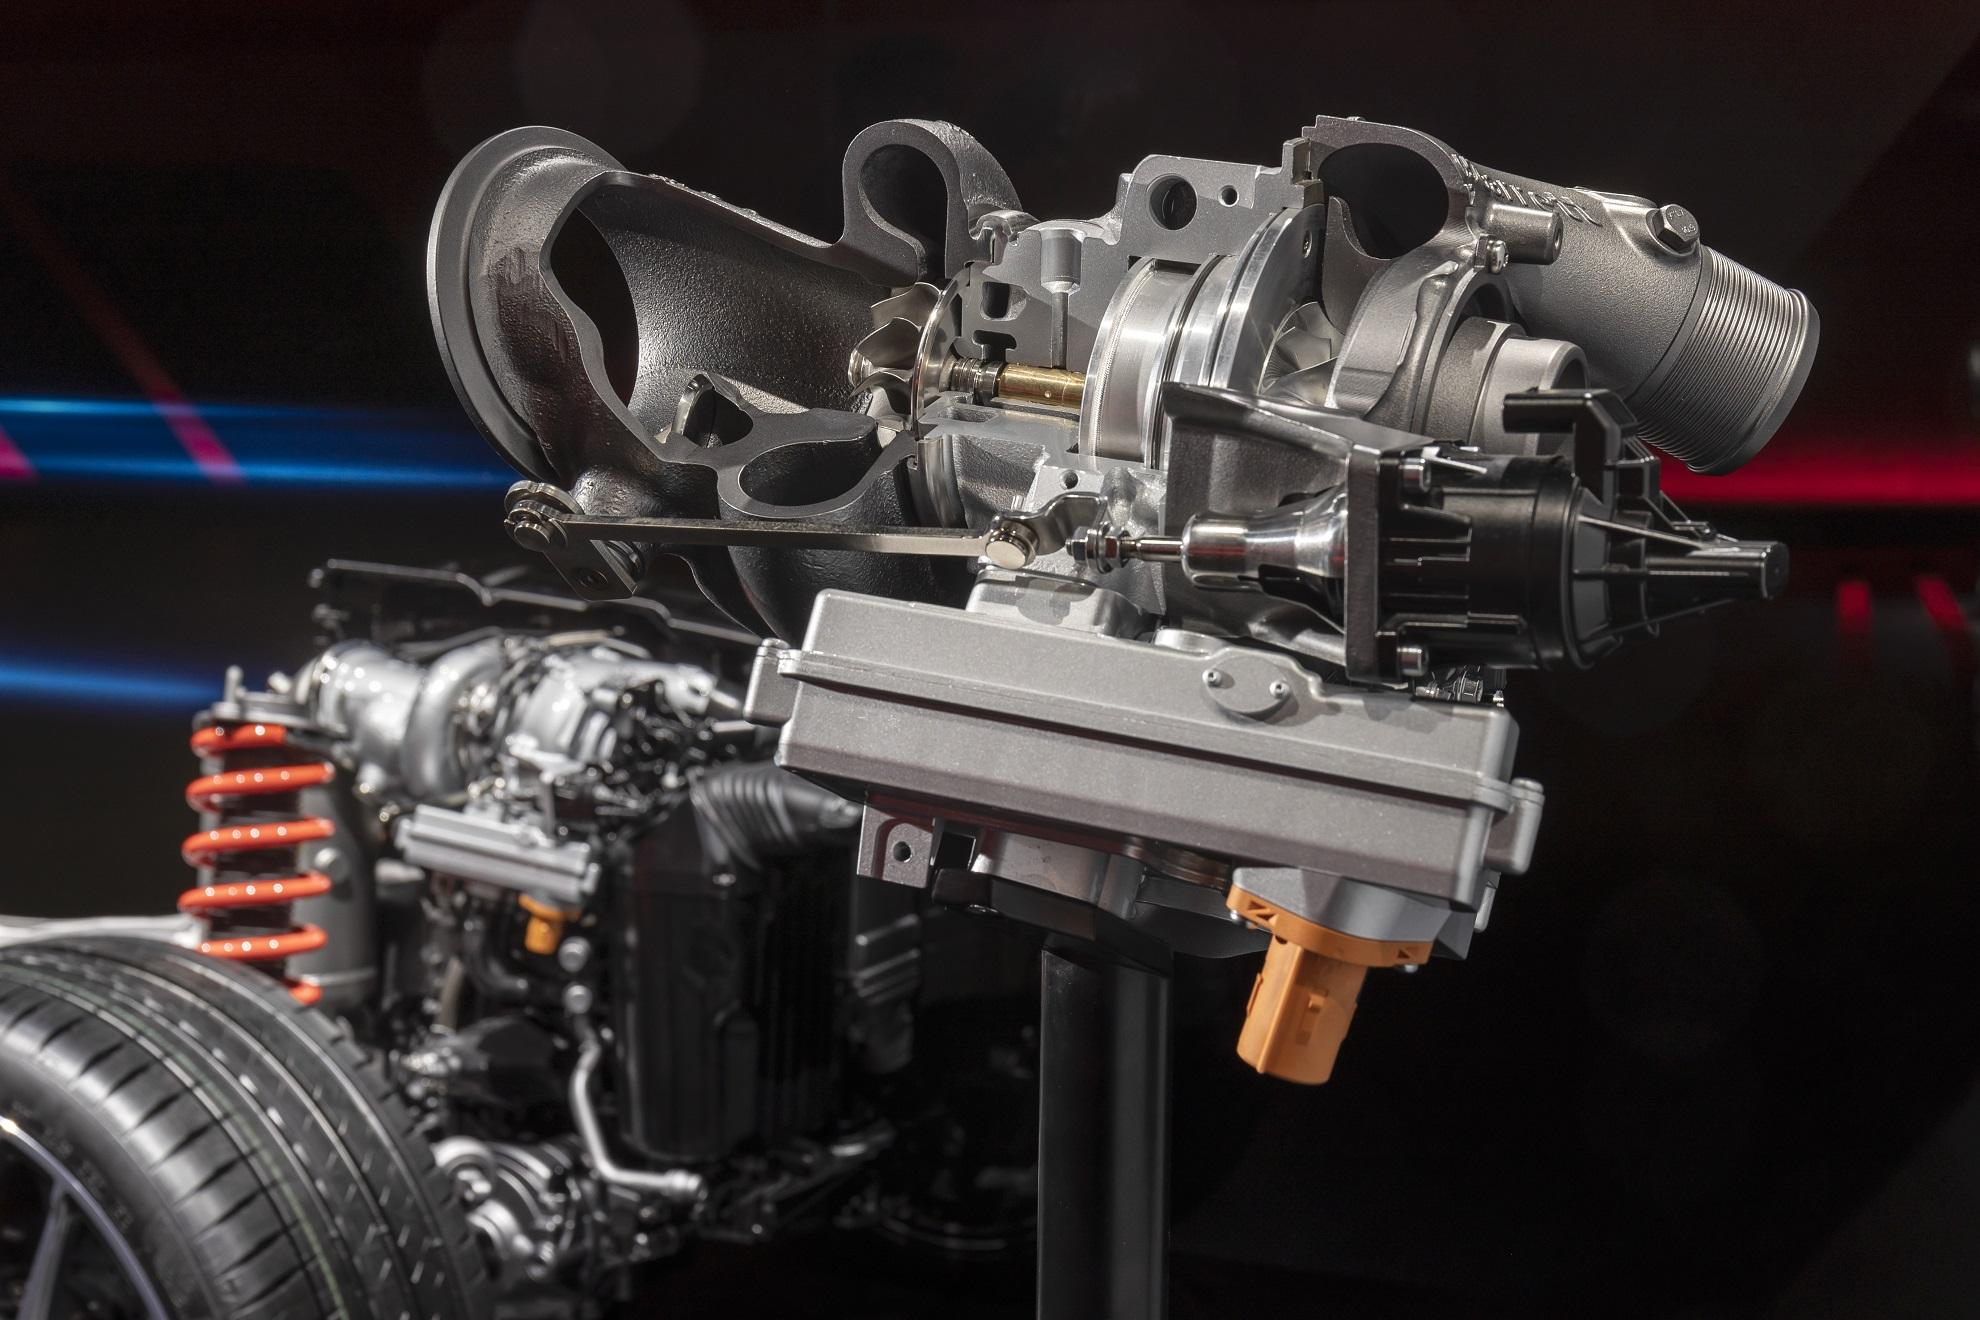 TecDAY AMG Future of Driving Performance Eigenständige E PERFORMANCE Antriebsstrategie für Performance-Hybride; Antriebsstrang 4-Zylinder (M139); Elektrischer Abgasturbolader // TecDAY AMG Future of Driving Performance Independent E PERFORMANCE drivetrain strategy for performance hybrids; Drivetrain 4-cylinder (M139); Electric exhaust-gas turbocharger